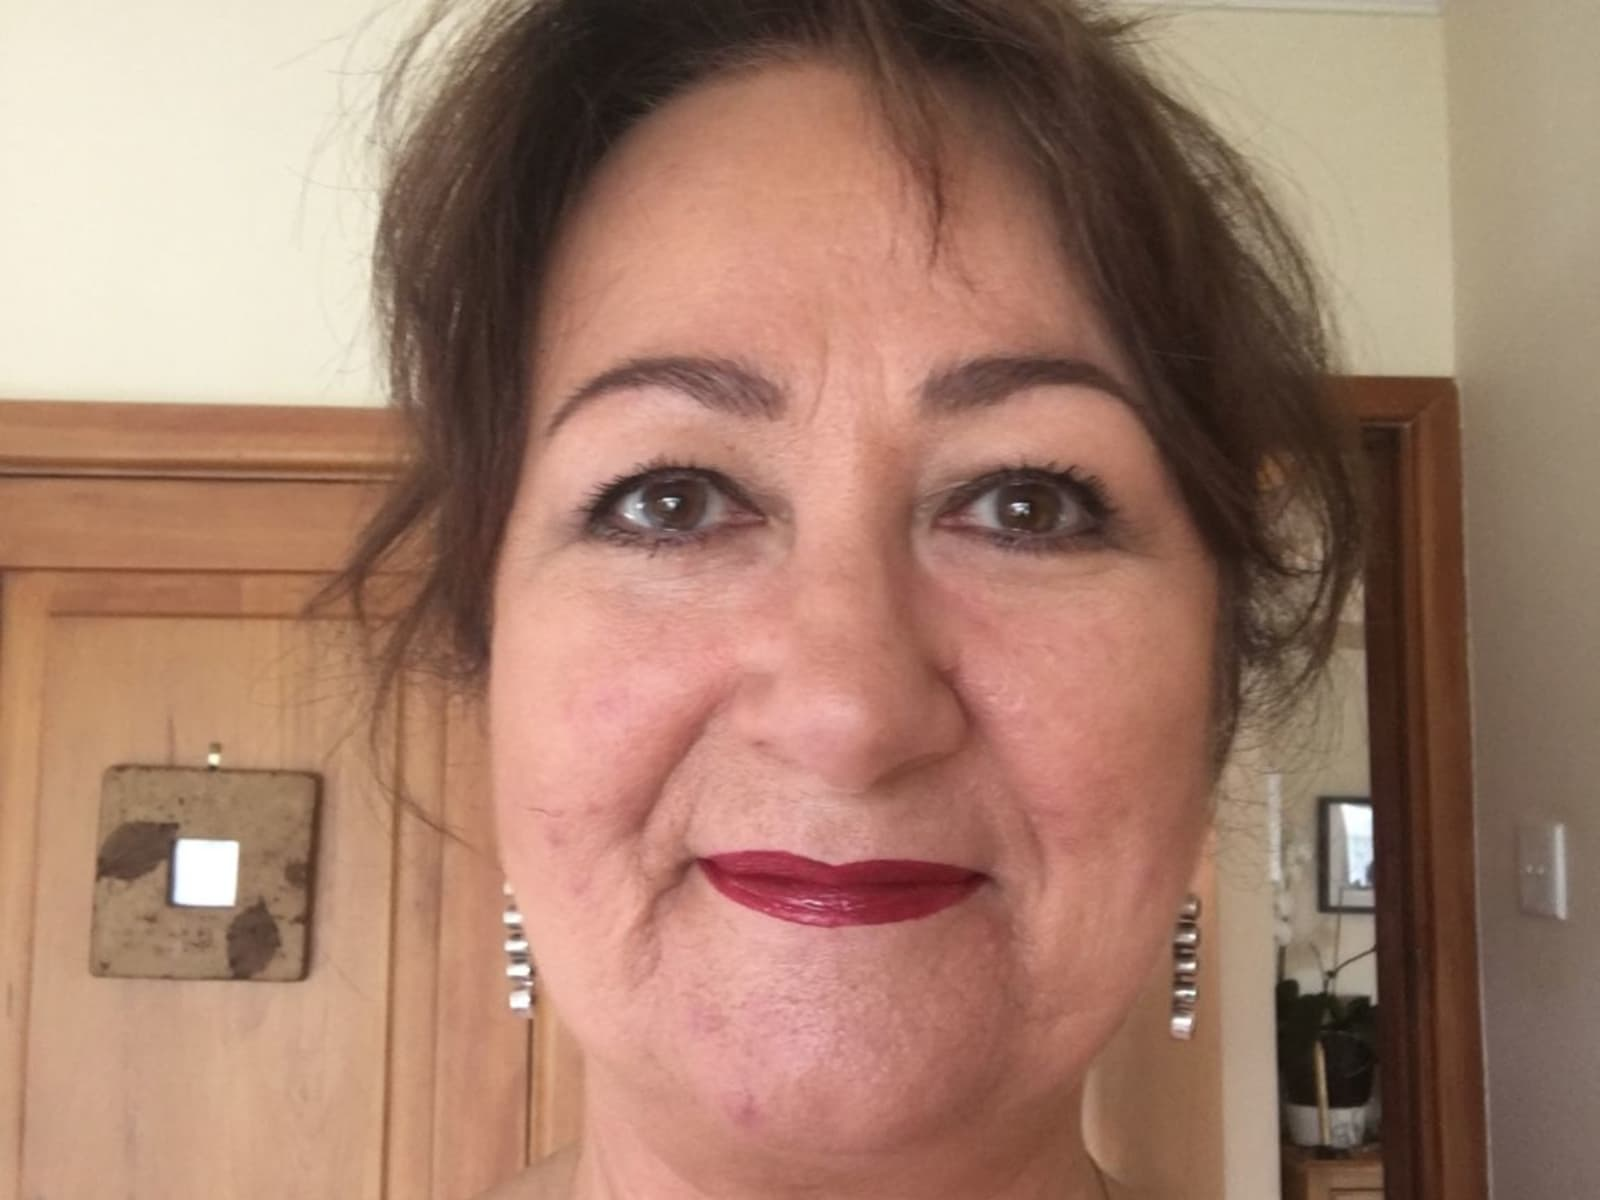 Lise from Wellington, New Zealand